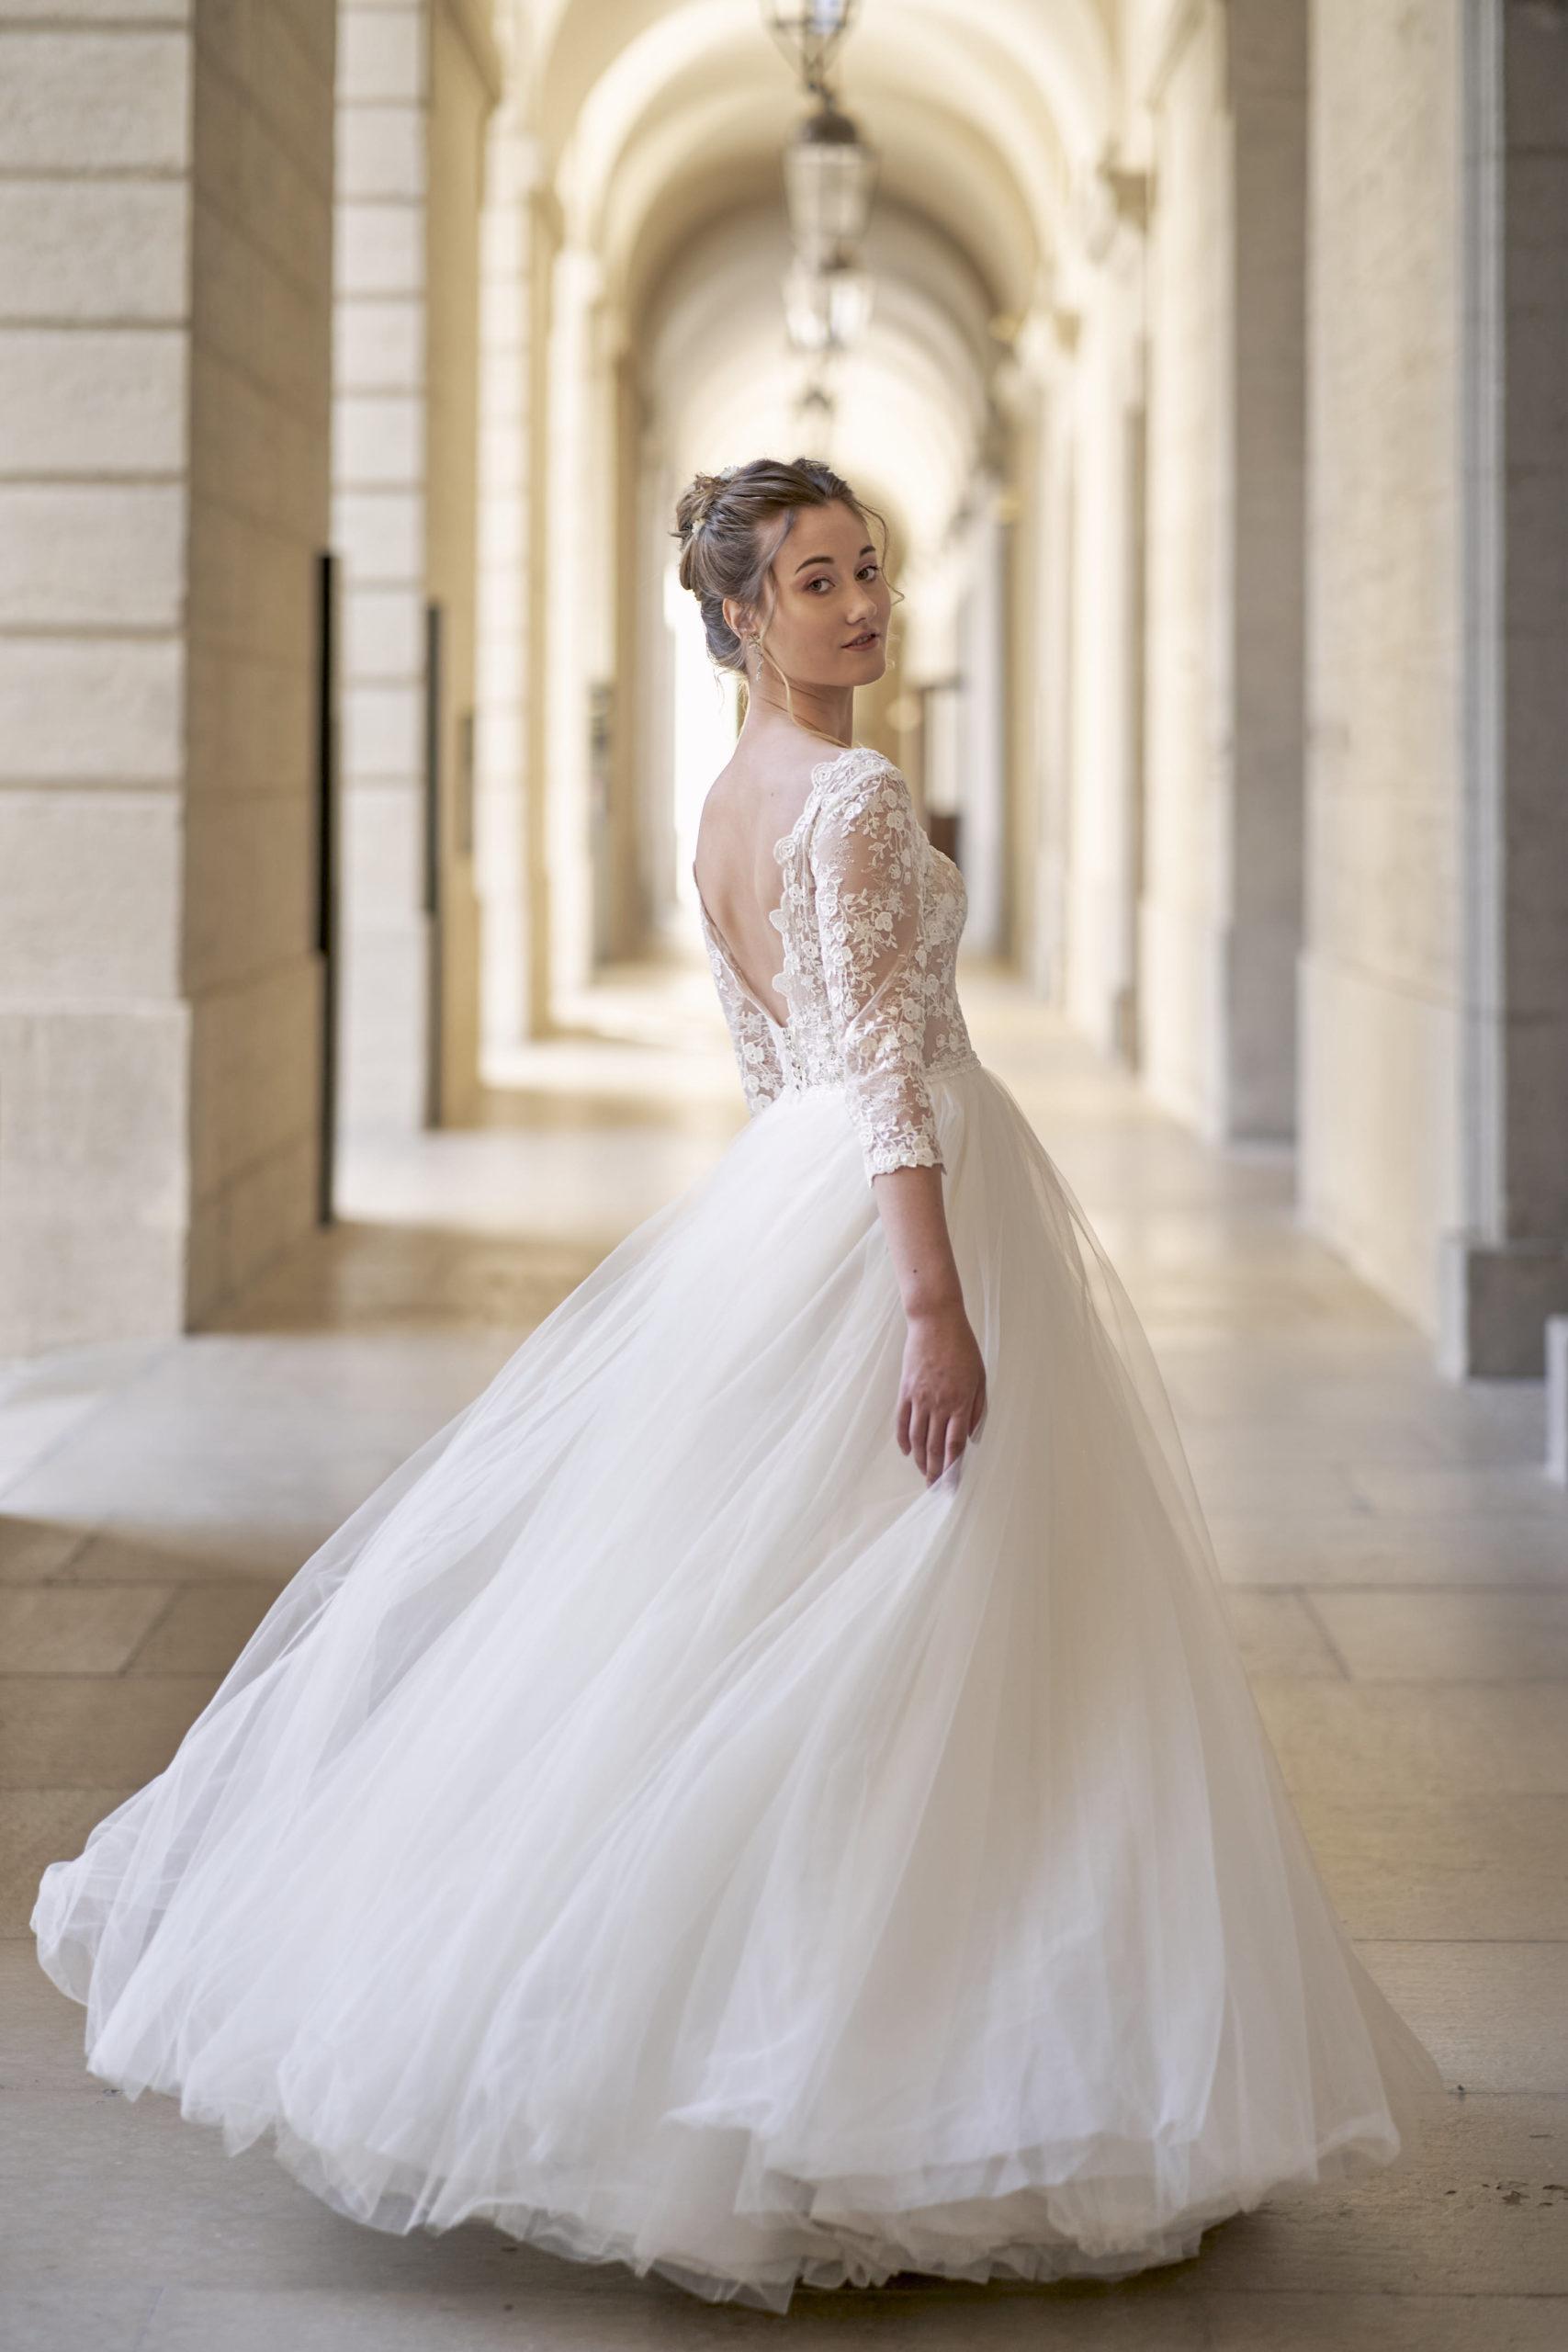 La mariée lyonnaise – wedding planner lyon – les moments m